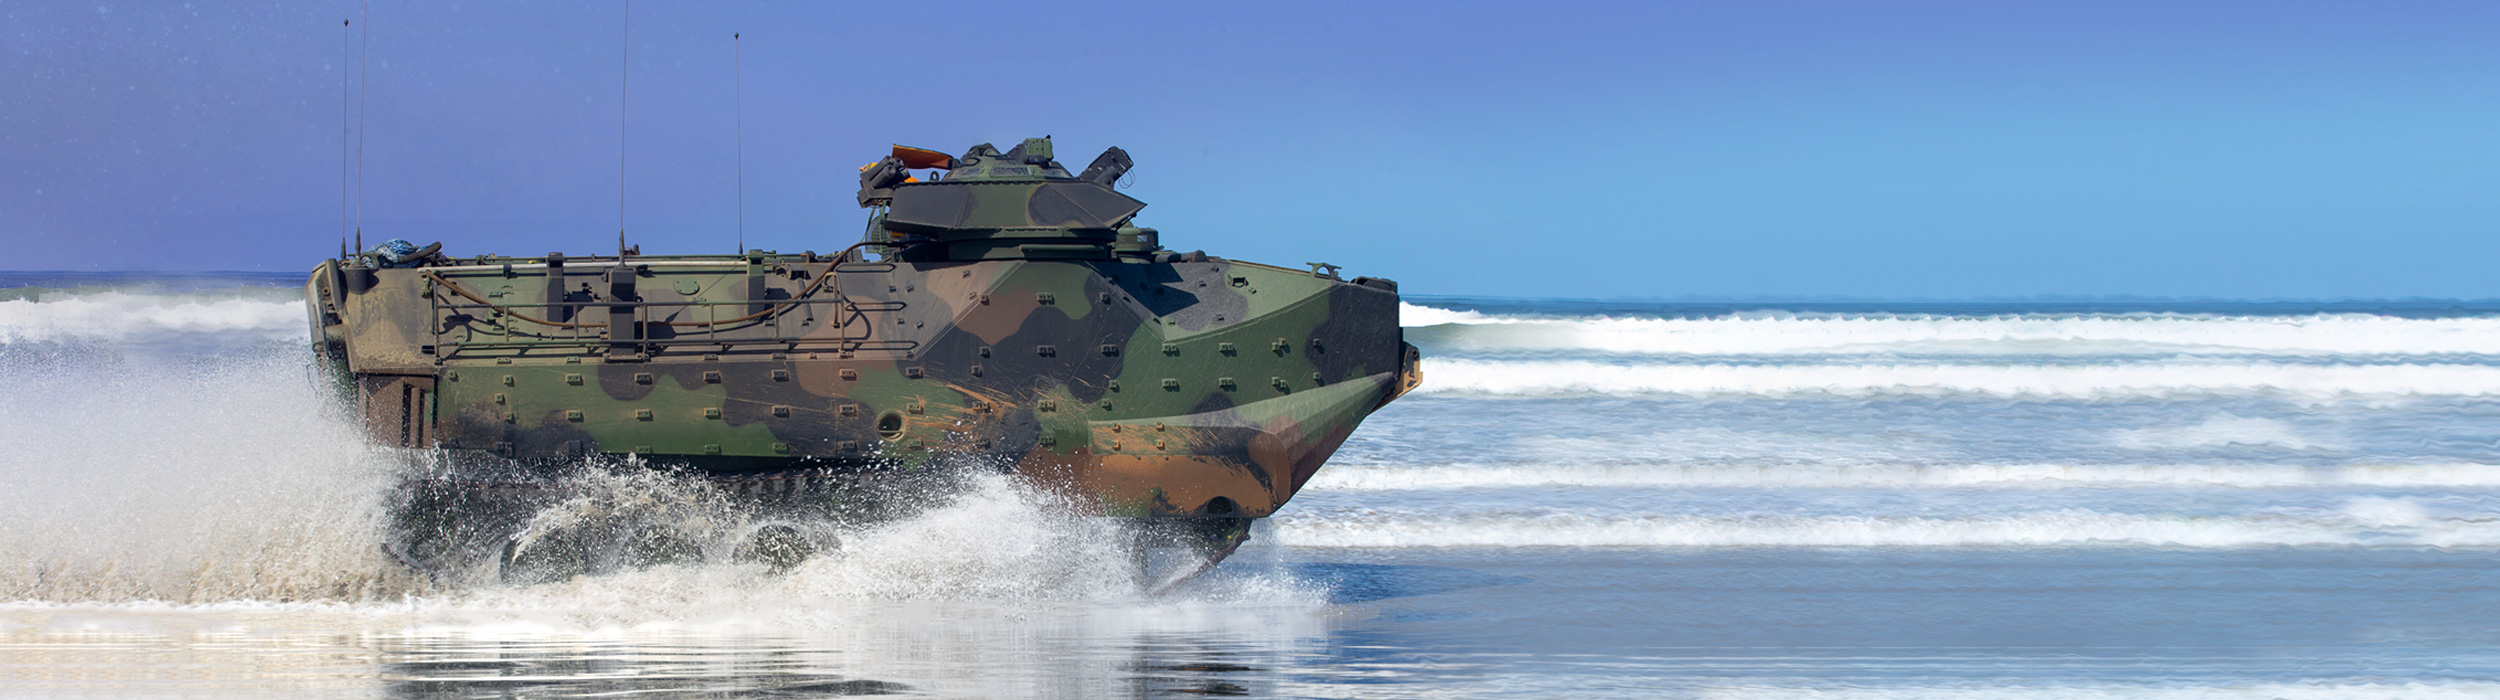 Ground Image - Assault vehicle on beach